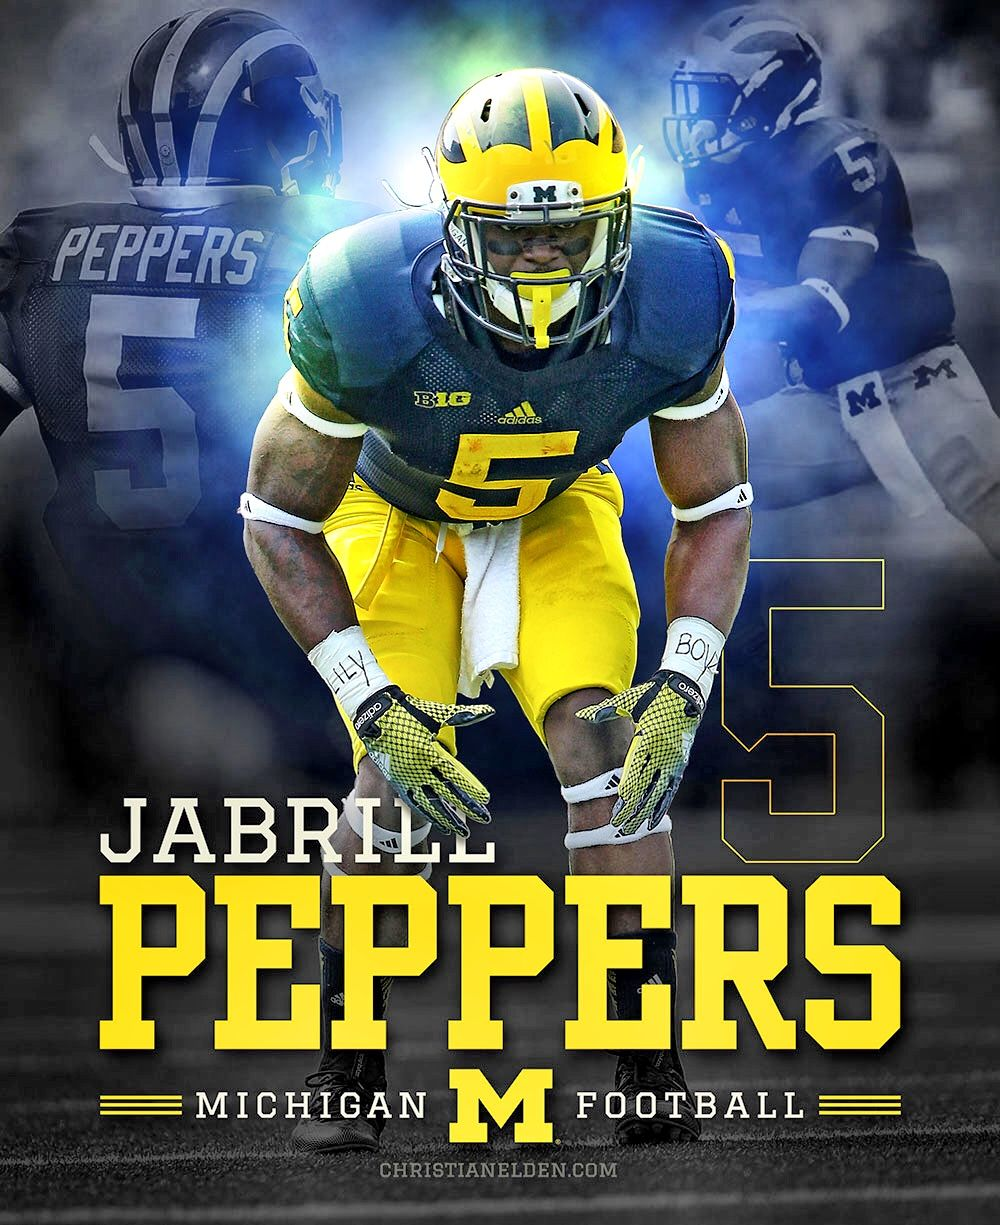 Jabrill Peppers Photoshop Design Christianelden Com The Online Home Of Designer Illustrator Chr Michigan Wolverines Football Michigan Michigan Wolverines